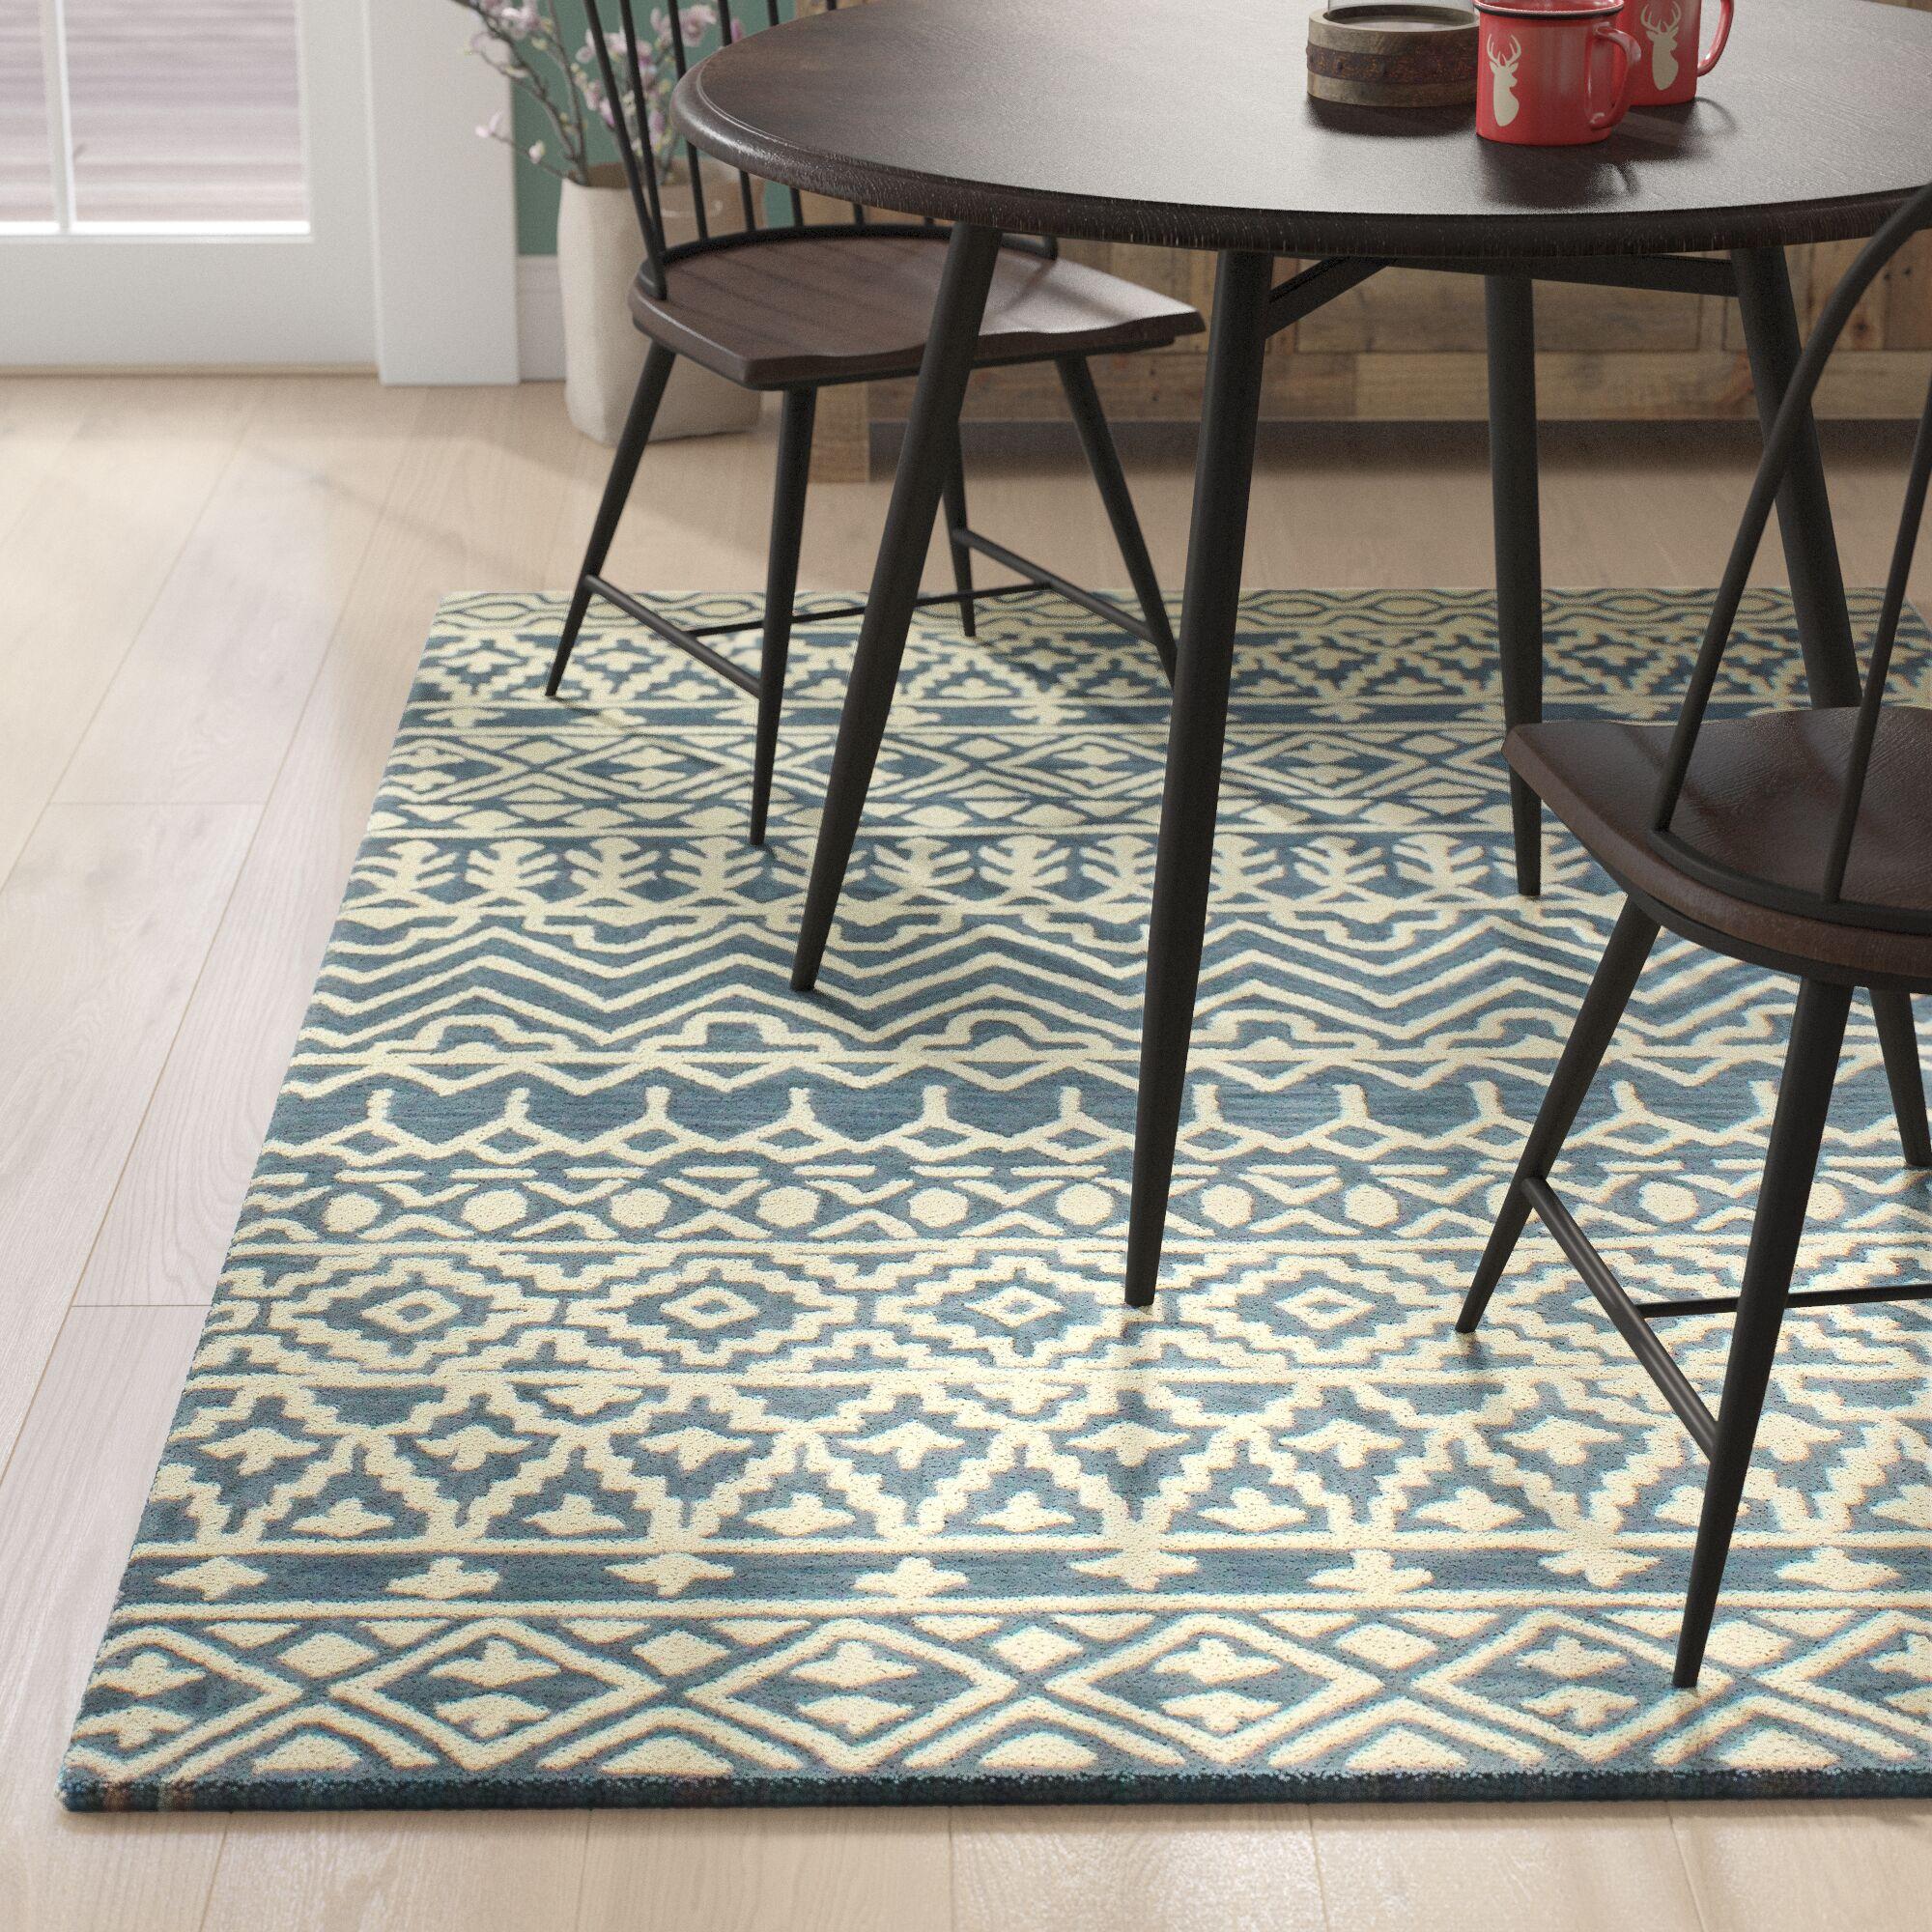 Peterman Hand-Tufted Wool Azure Area Rug Rug Size: 9' x 12'